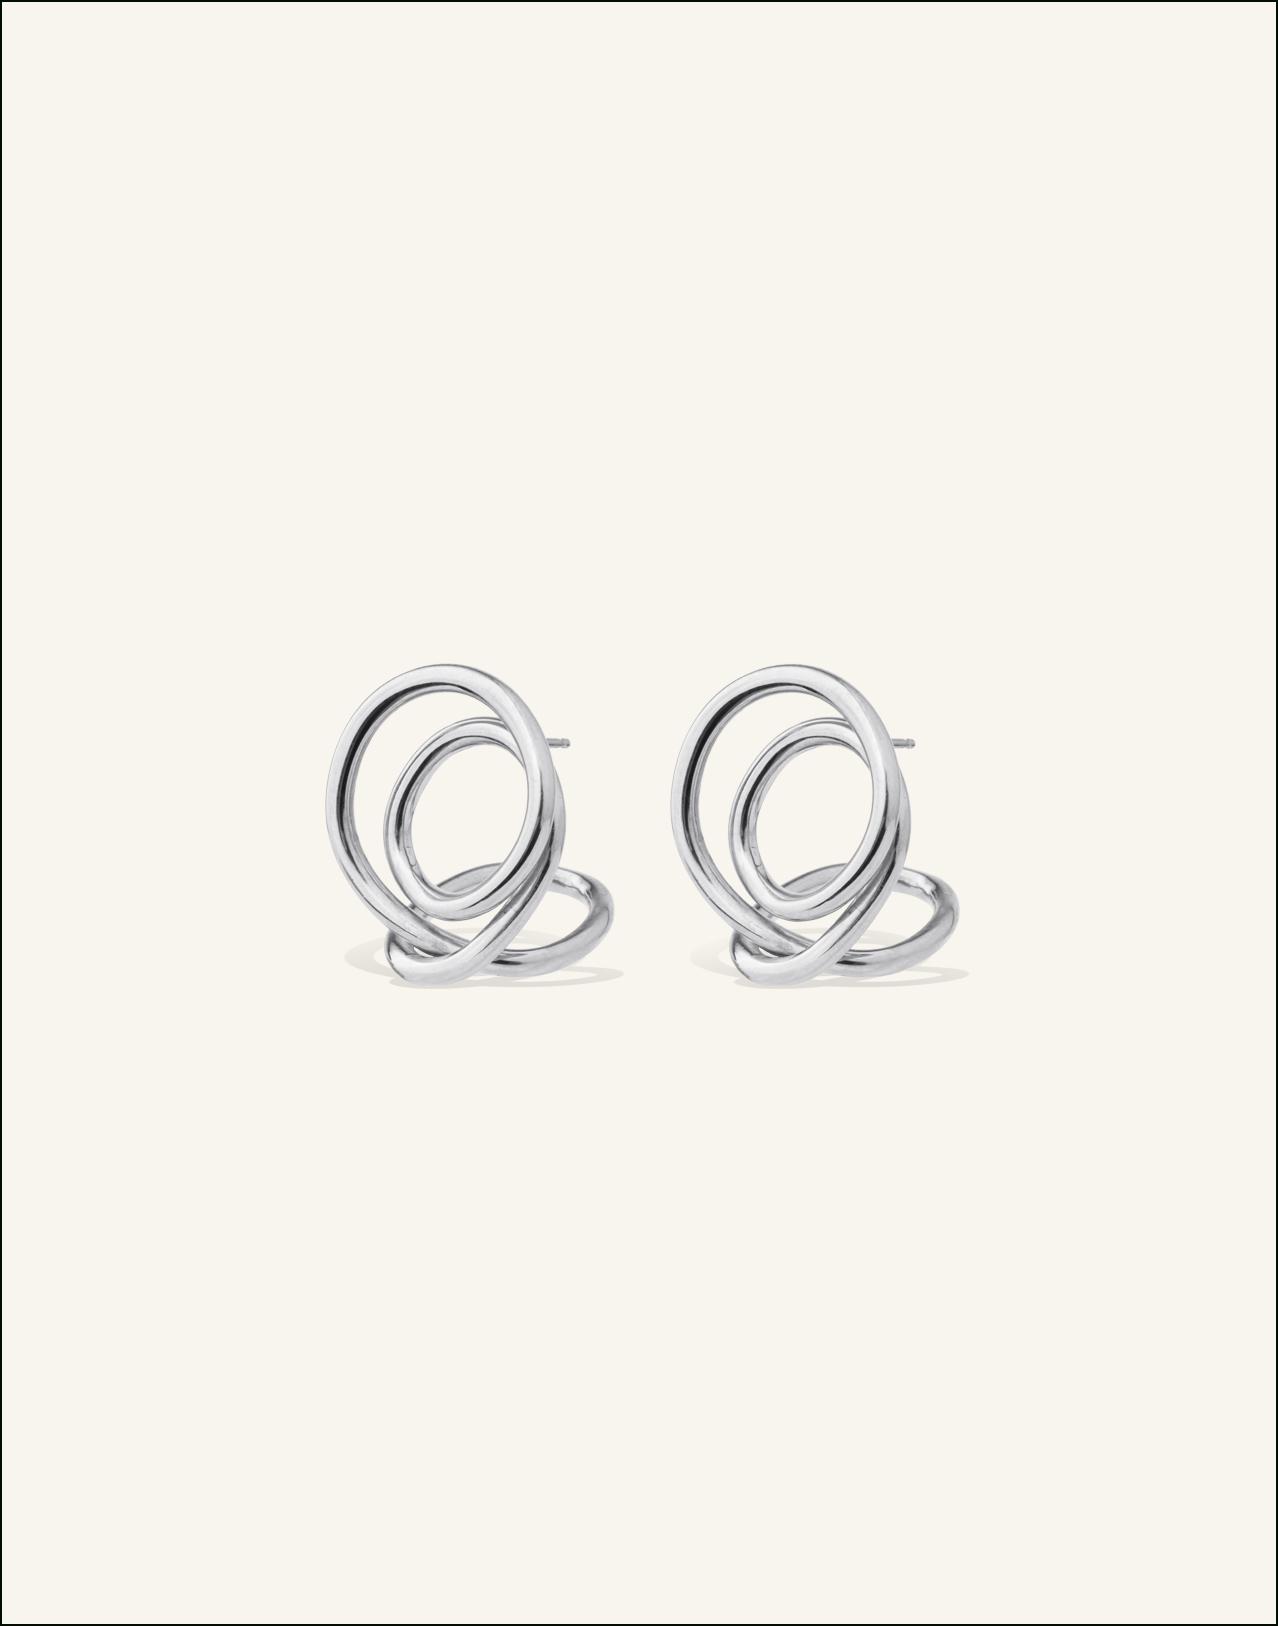 Completedworks-Silver-Earrings-The-Philosopher-3-1.jpg